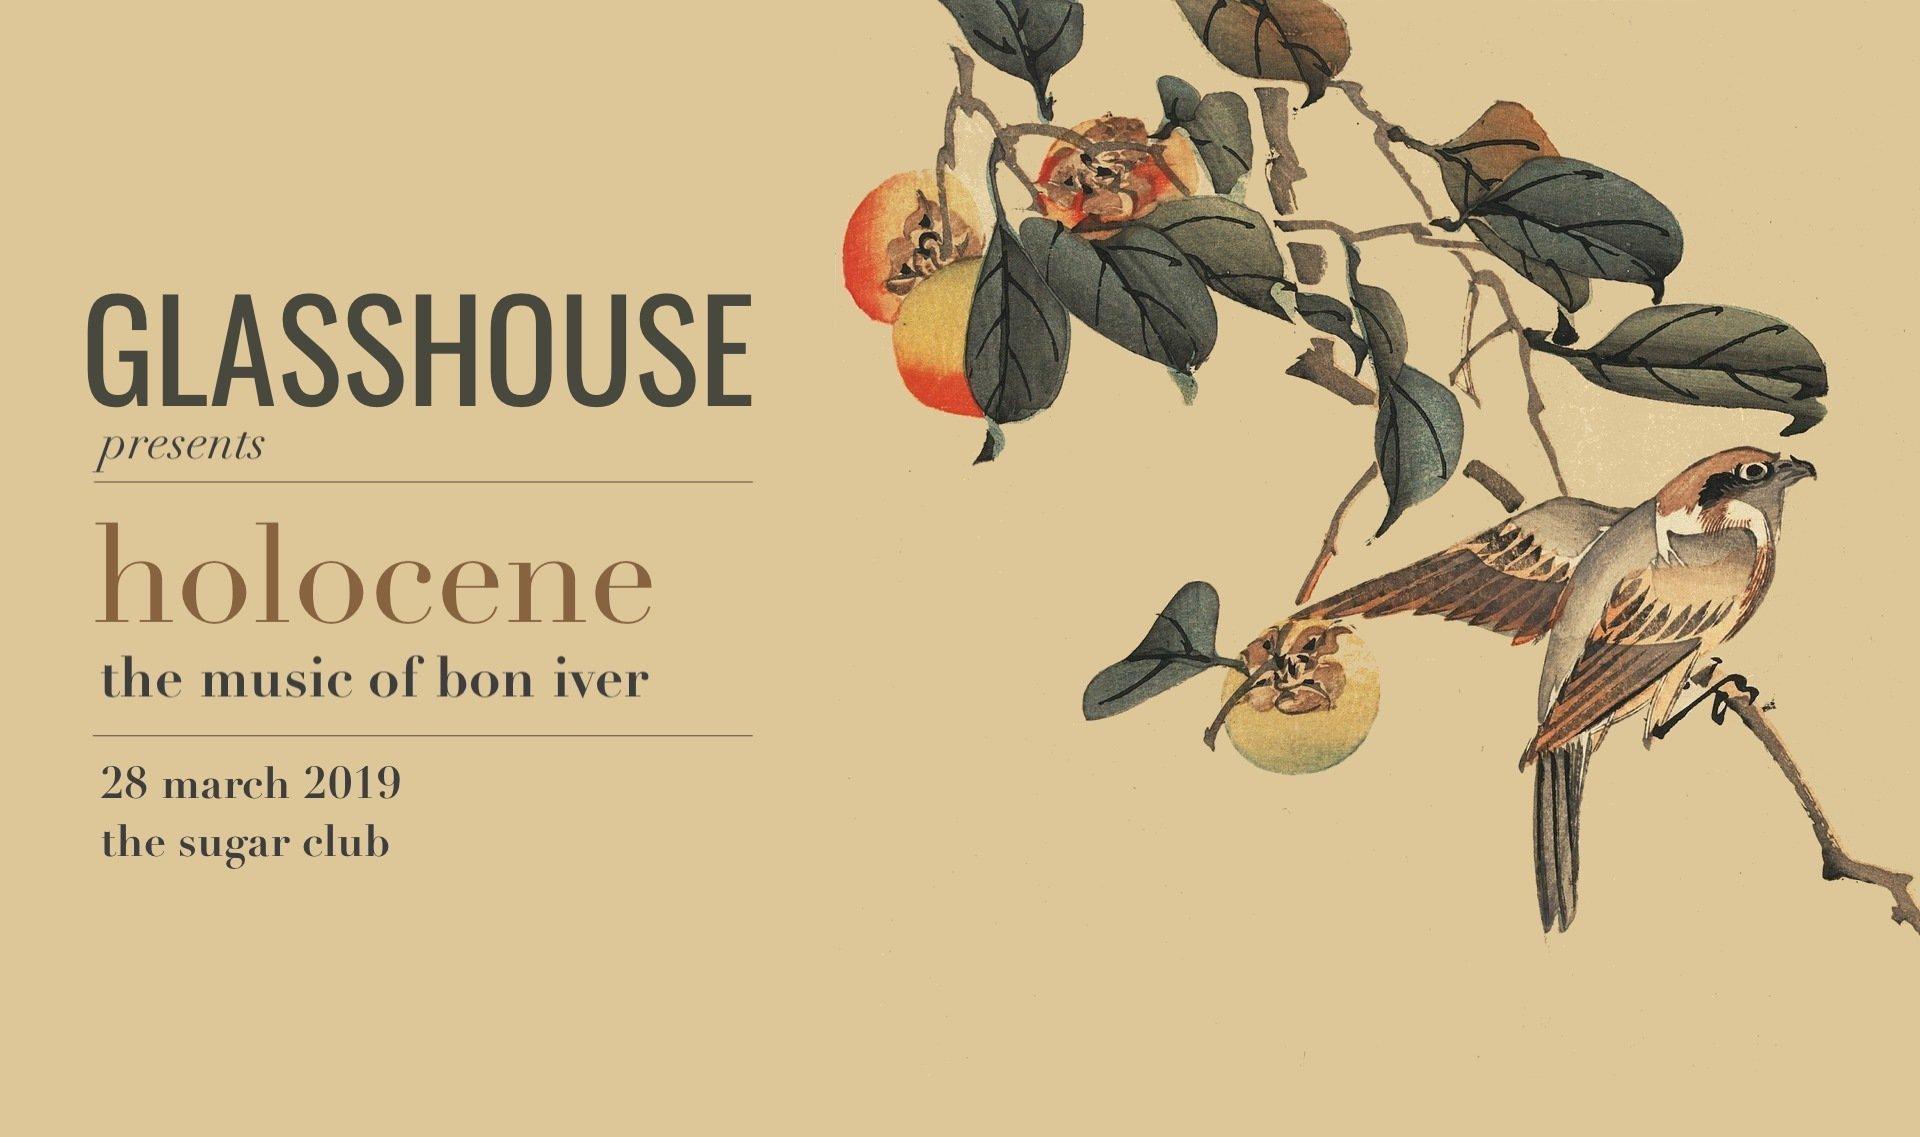 Glasshouse Presents Holocene